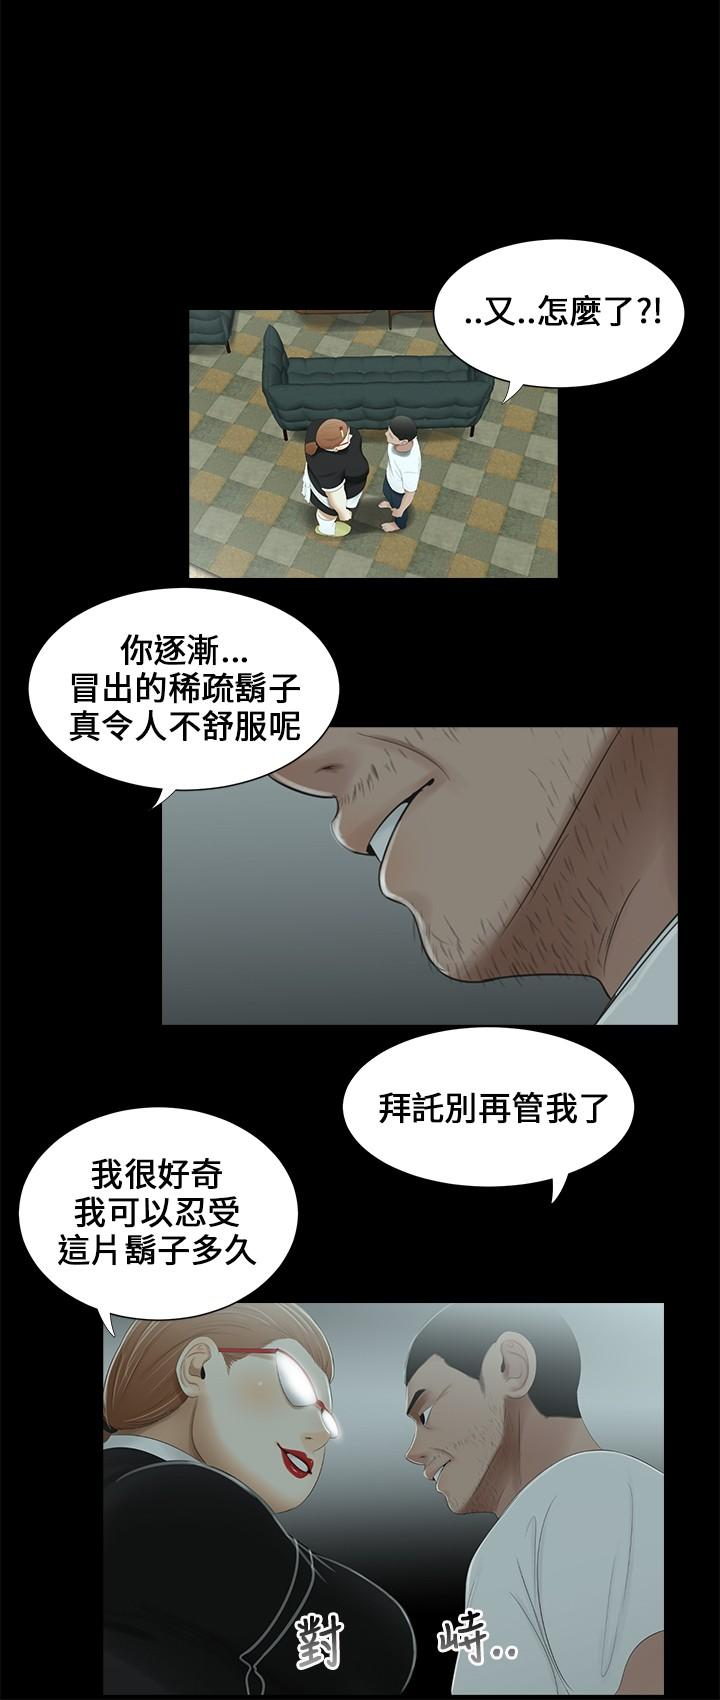 Three sisters 三姐妹Ch.13~19 (Chinese)中文 51